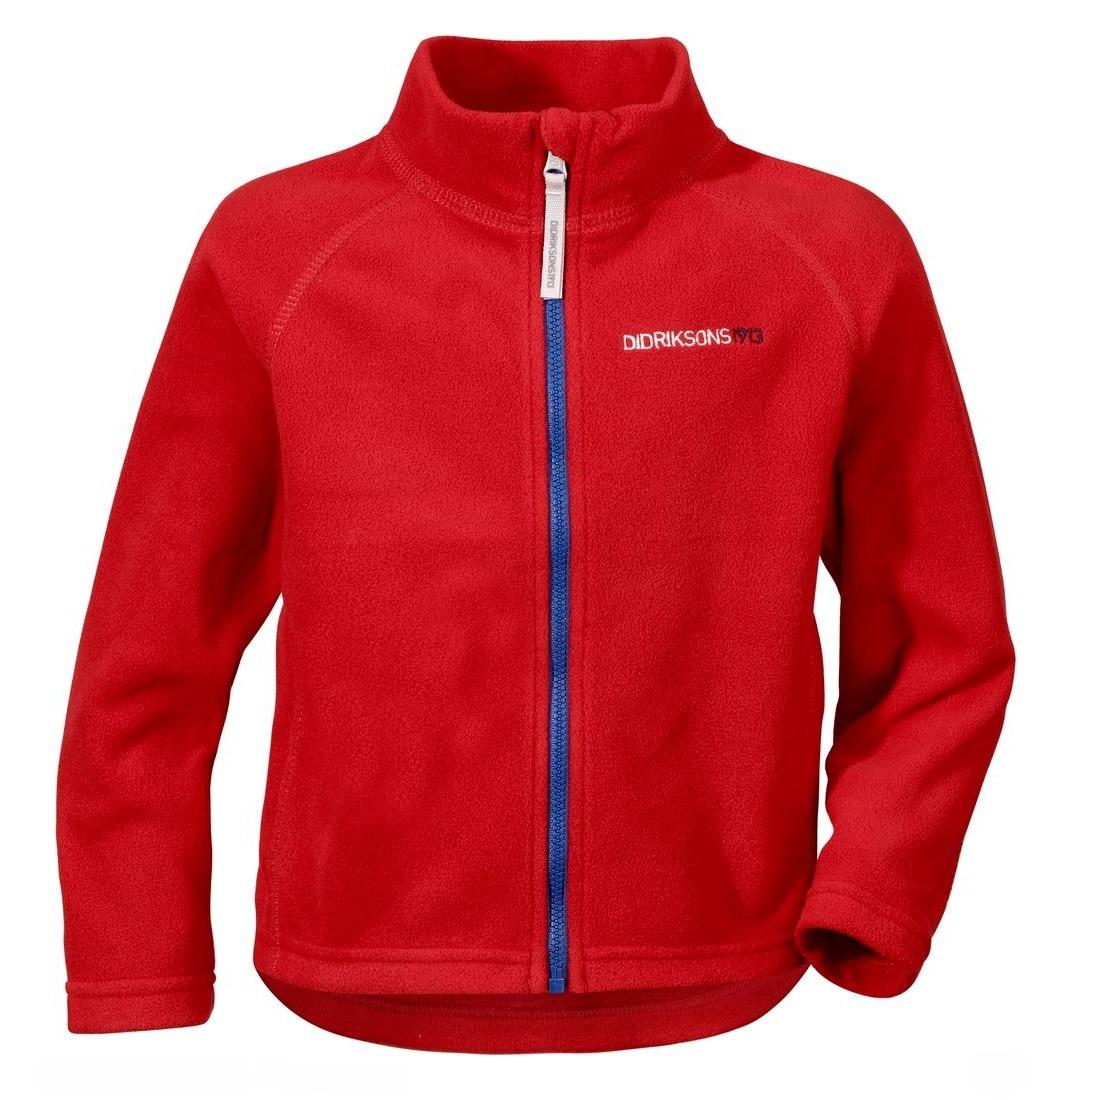 Куртка для детей Didriksons Monte kids - Red (красный)